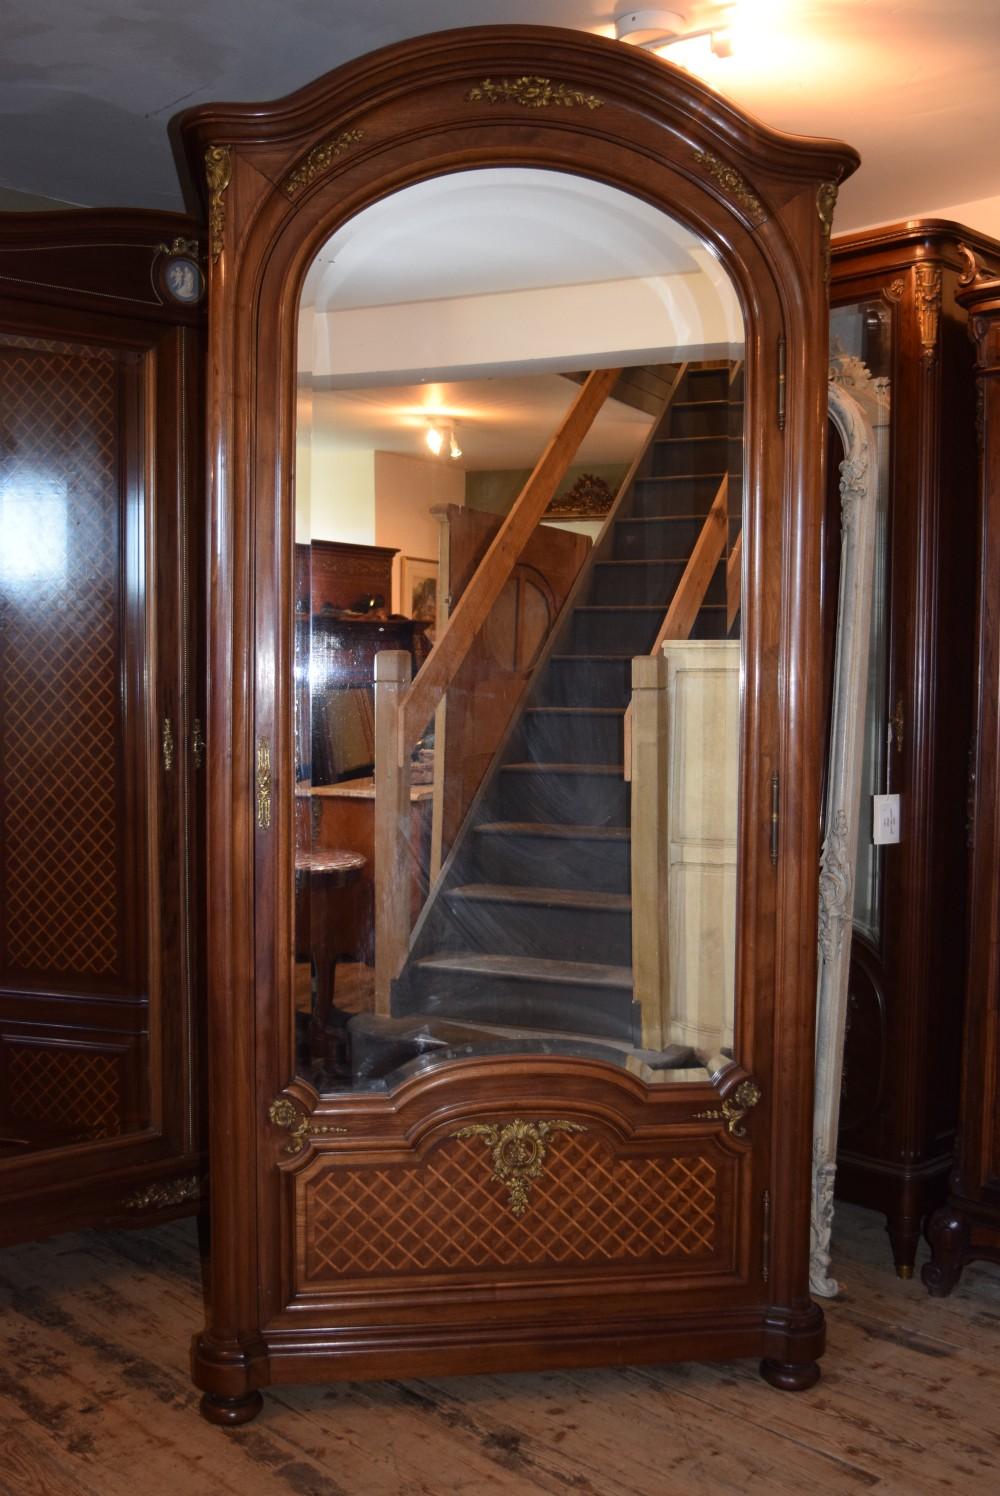 french louis xv1 style armoire